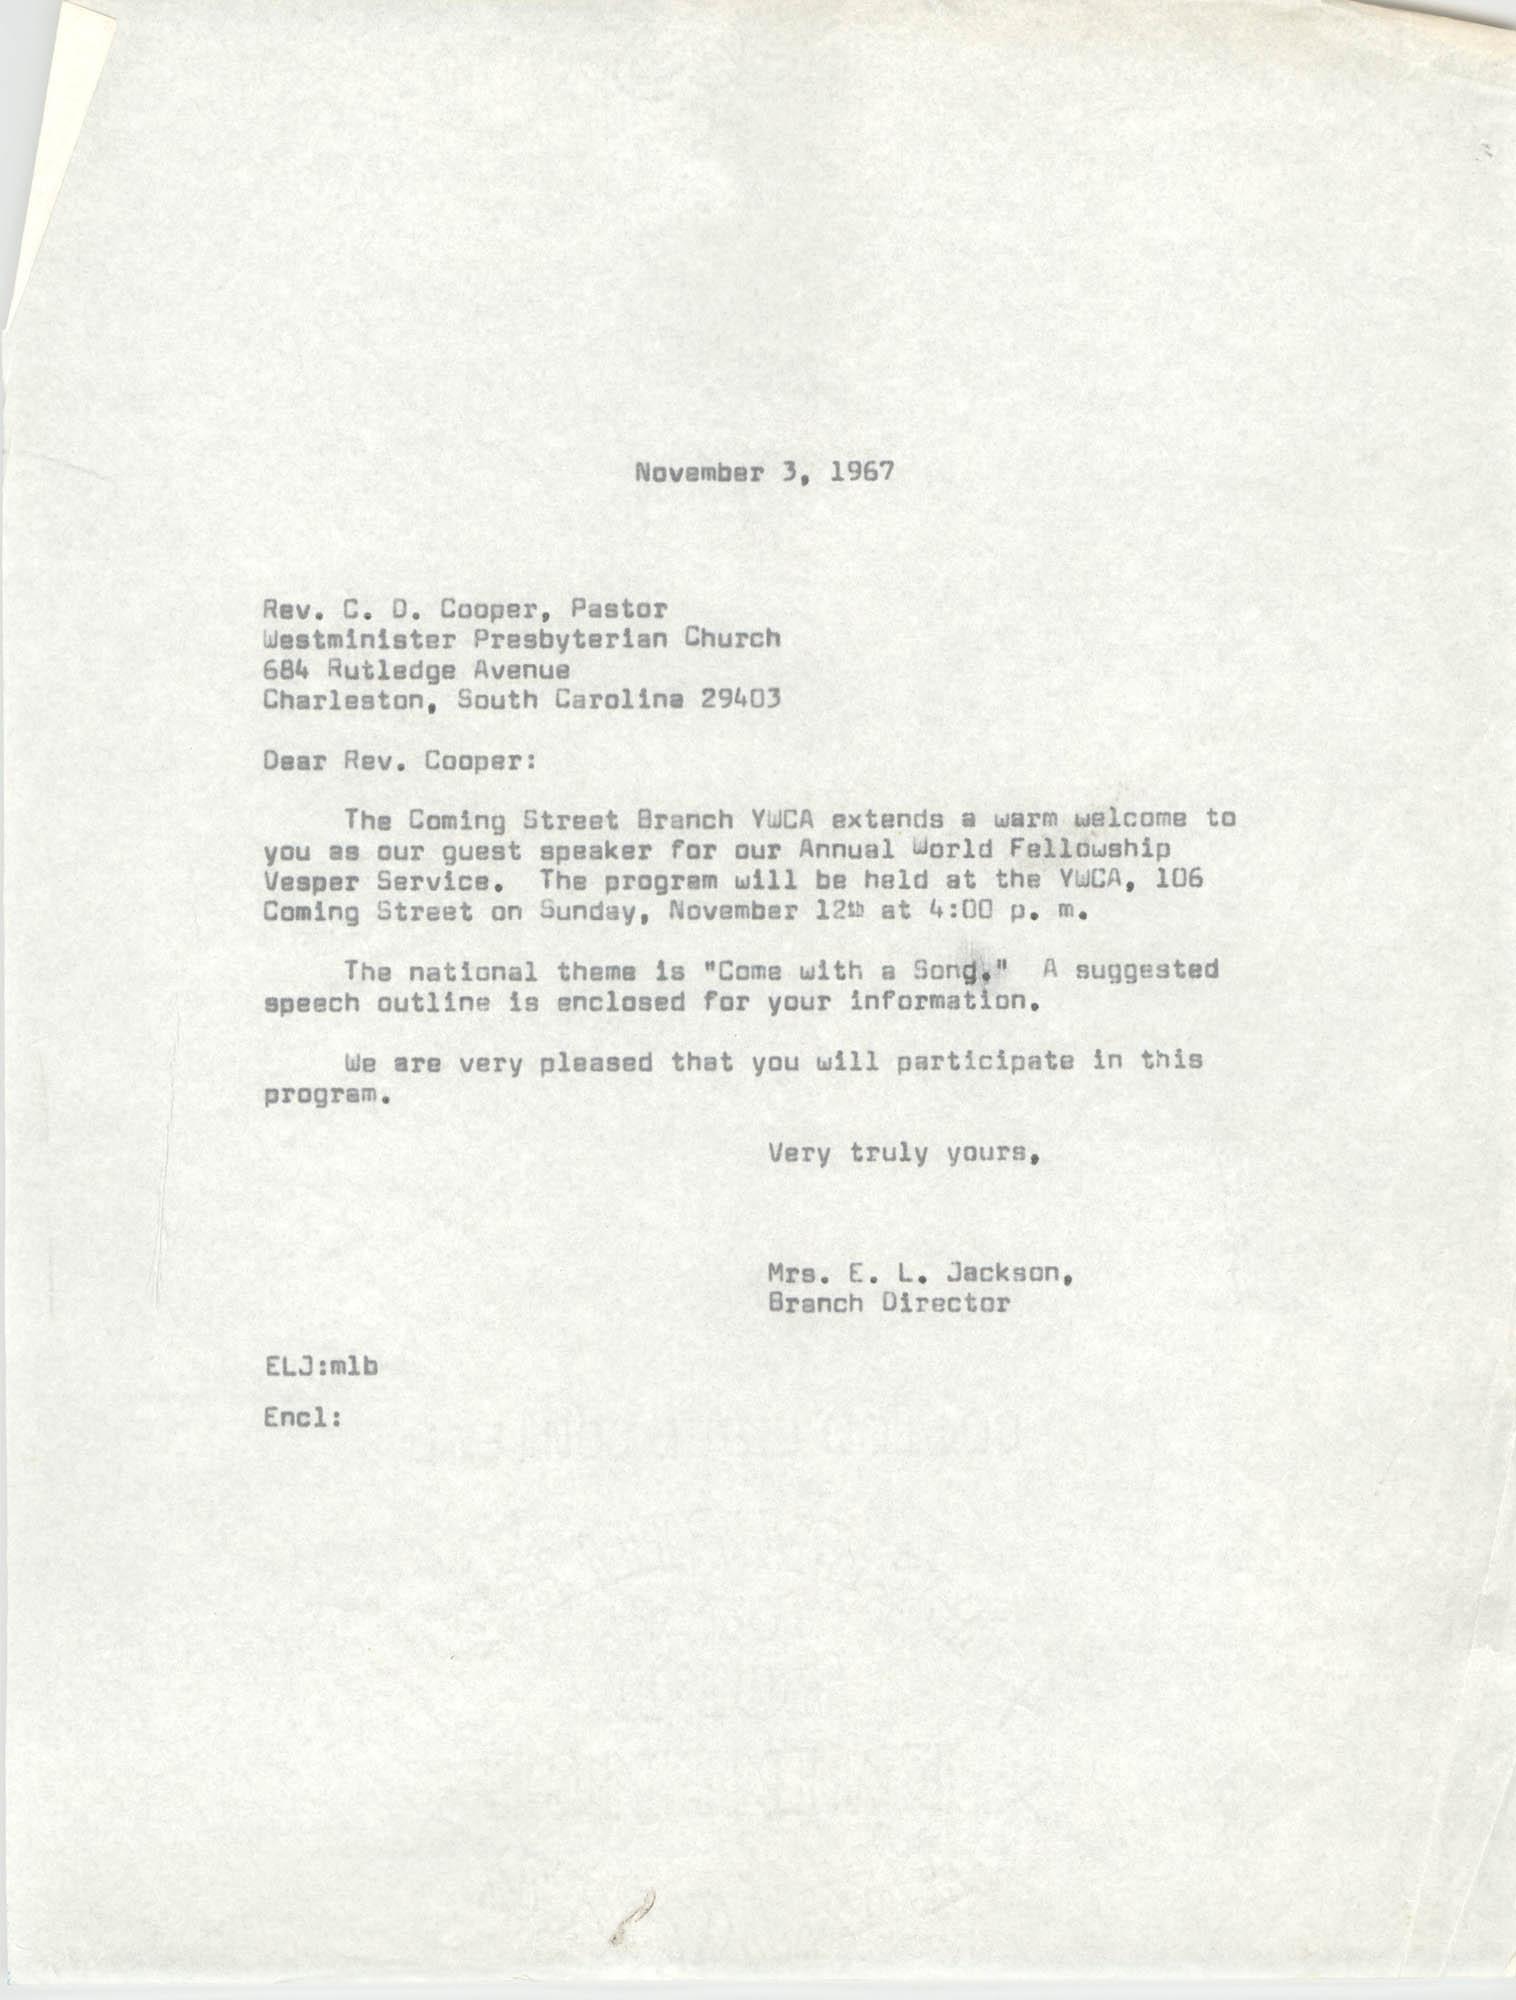 Letter from Christine O. Jackson to C. D. Cooper, November 3, 1967